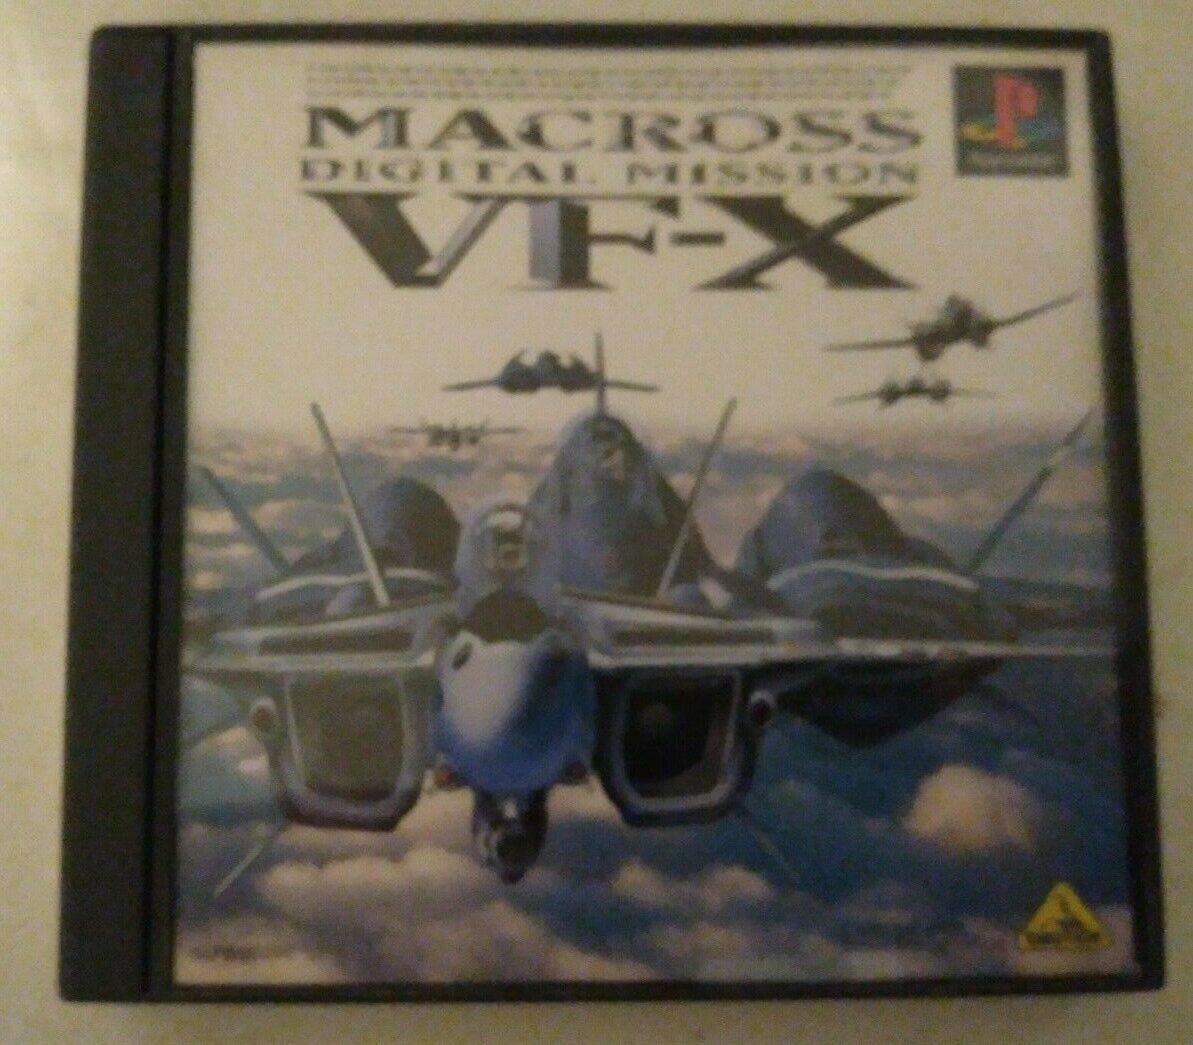 Macross Digital Mission VF-X (Sony PlayStation 1)) Japan Import PS1 PS2